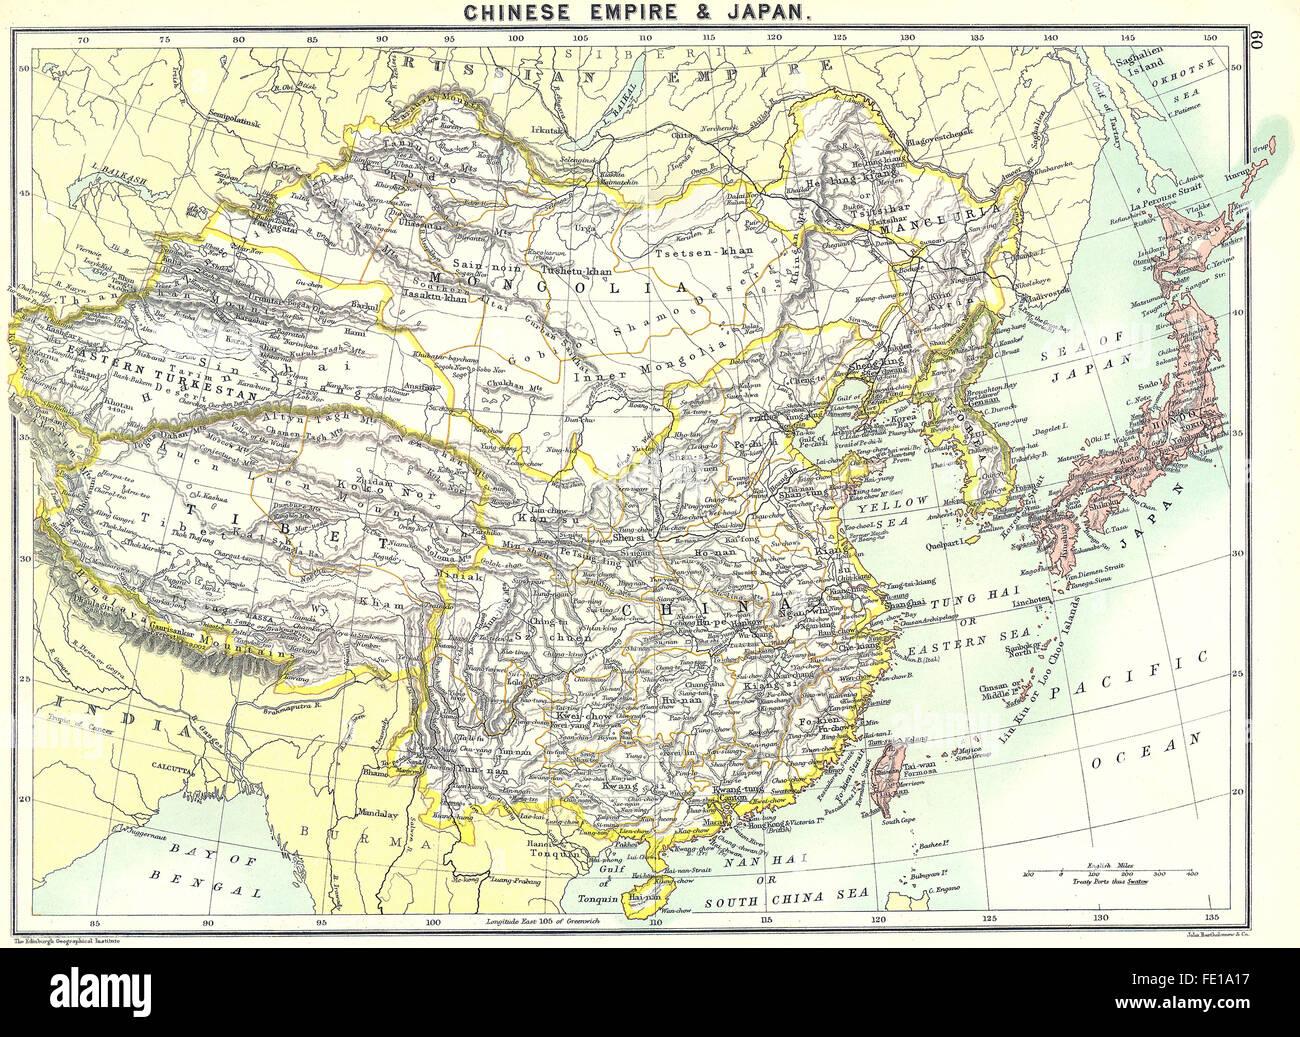 japan china 1900 antique map stock image